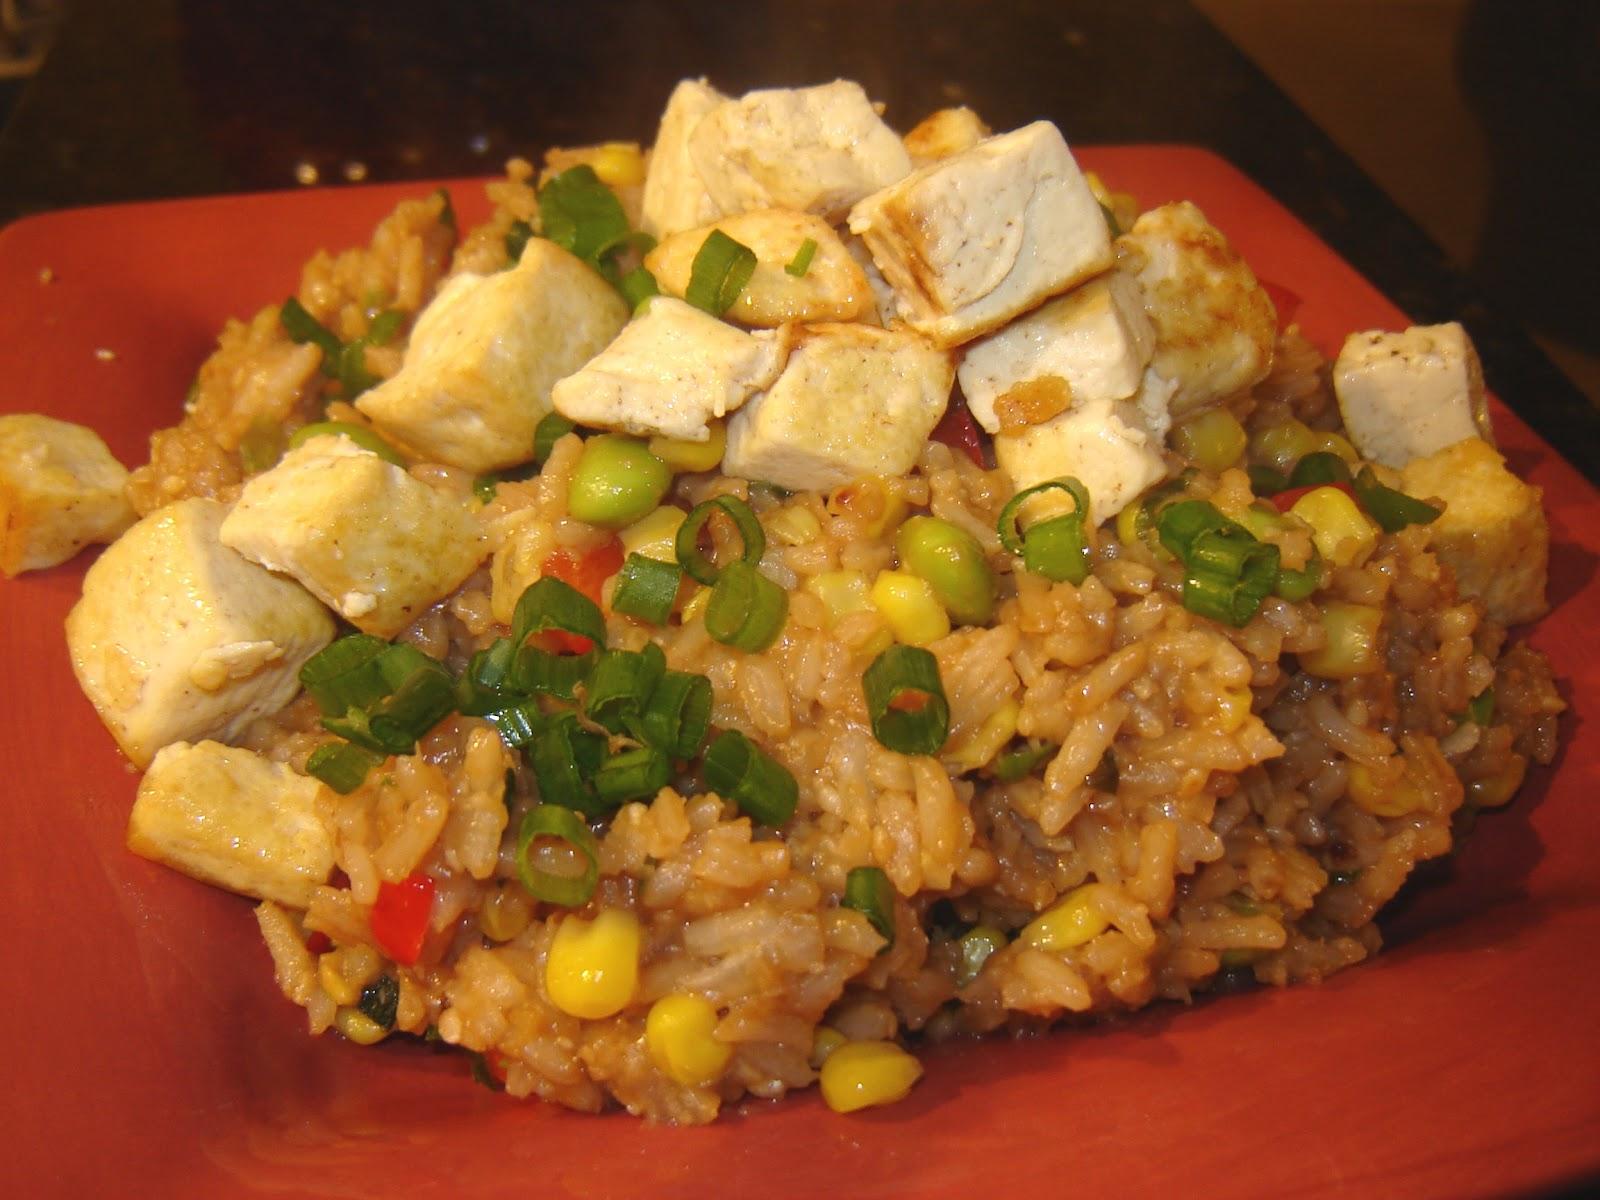 Dinner is Vegan: Veggie Fried Rice with Tofu